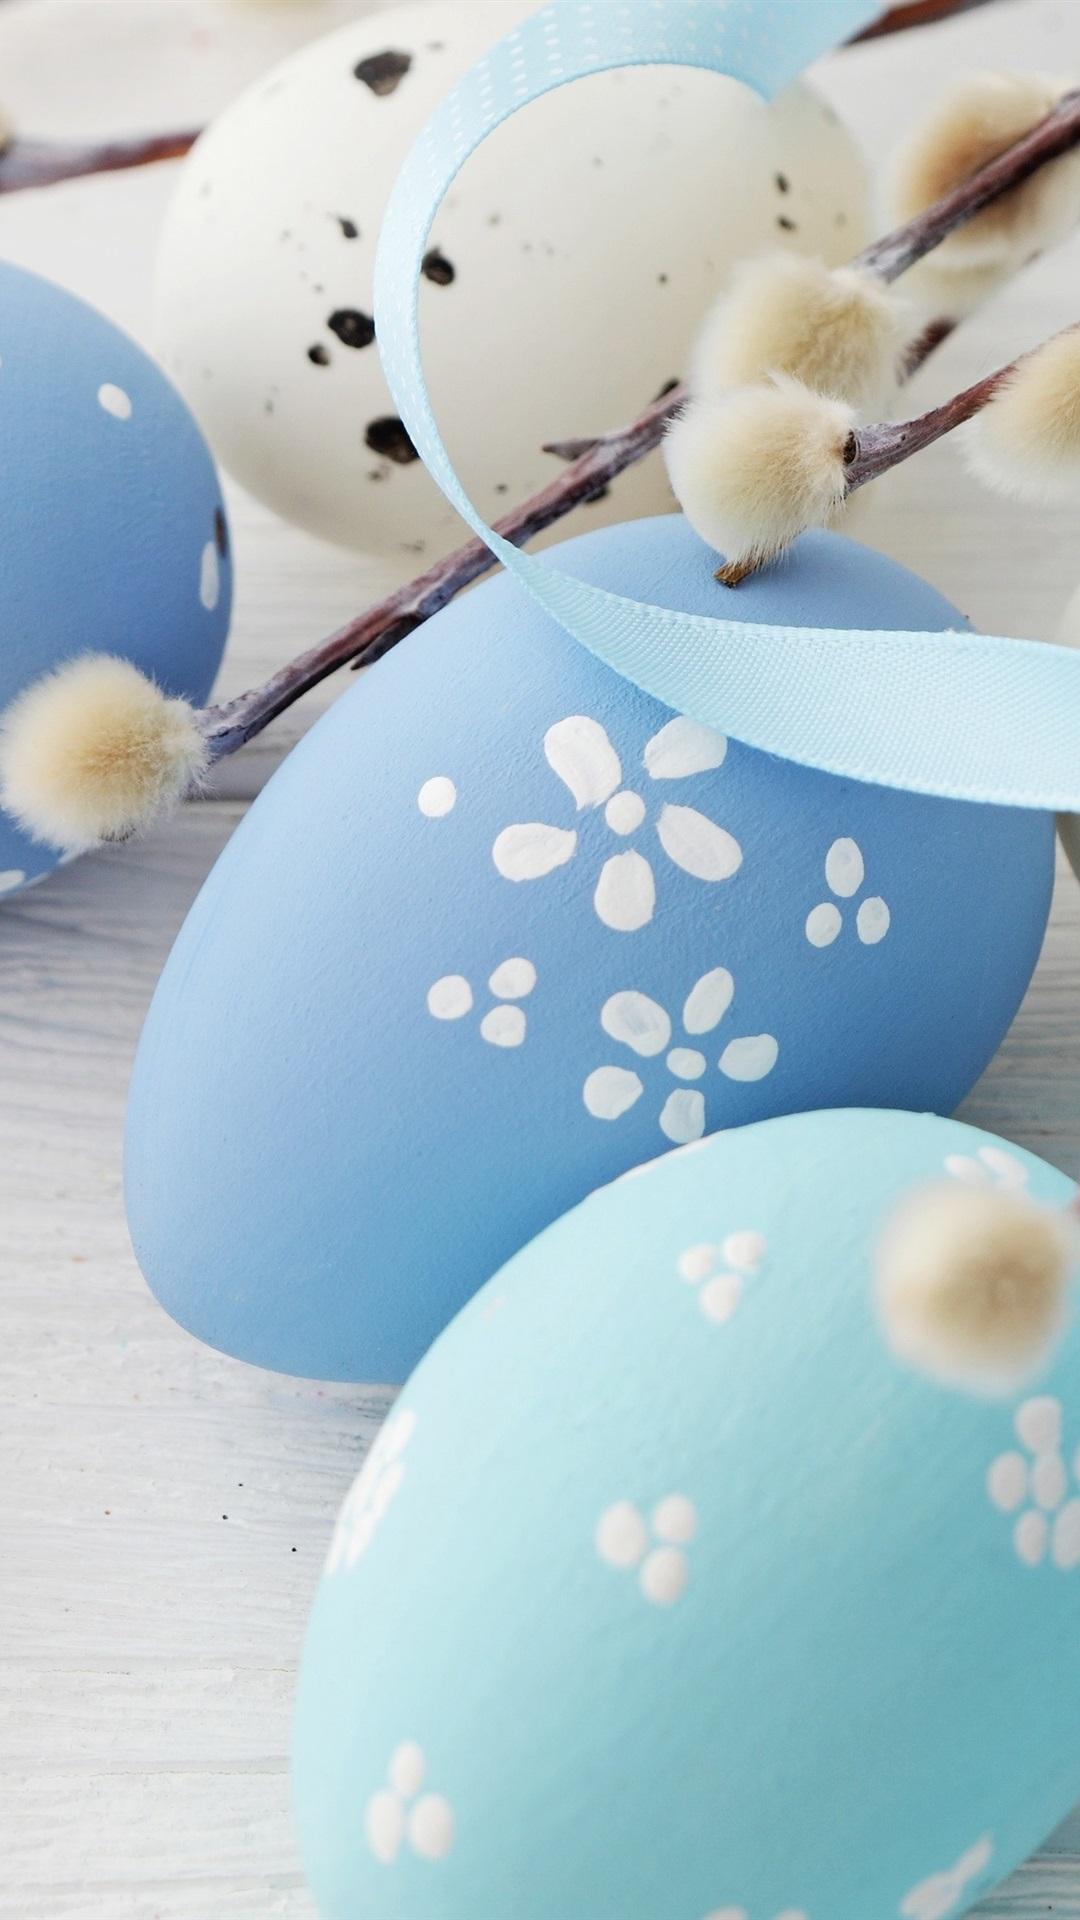 Blaue Eier Fröhliche Ostern 1080x1920 Iphone 8766s Plus